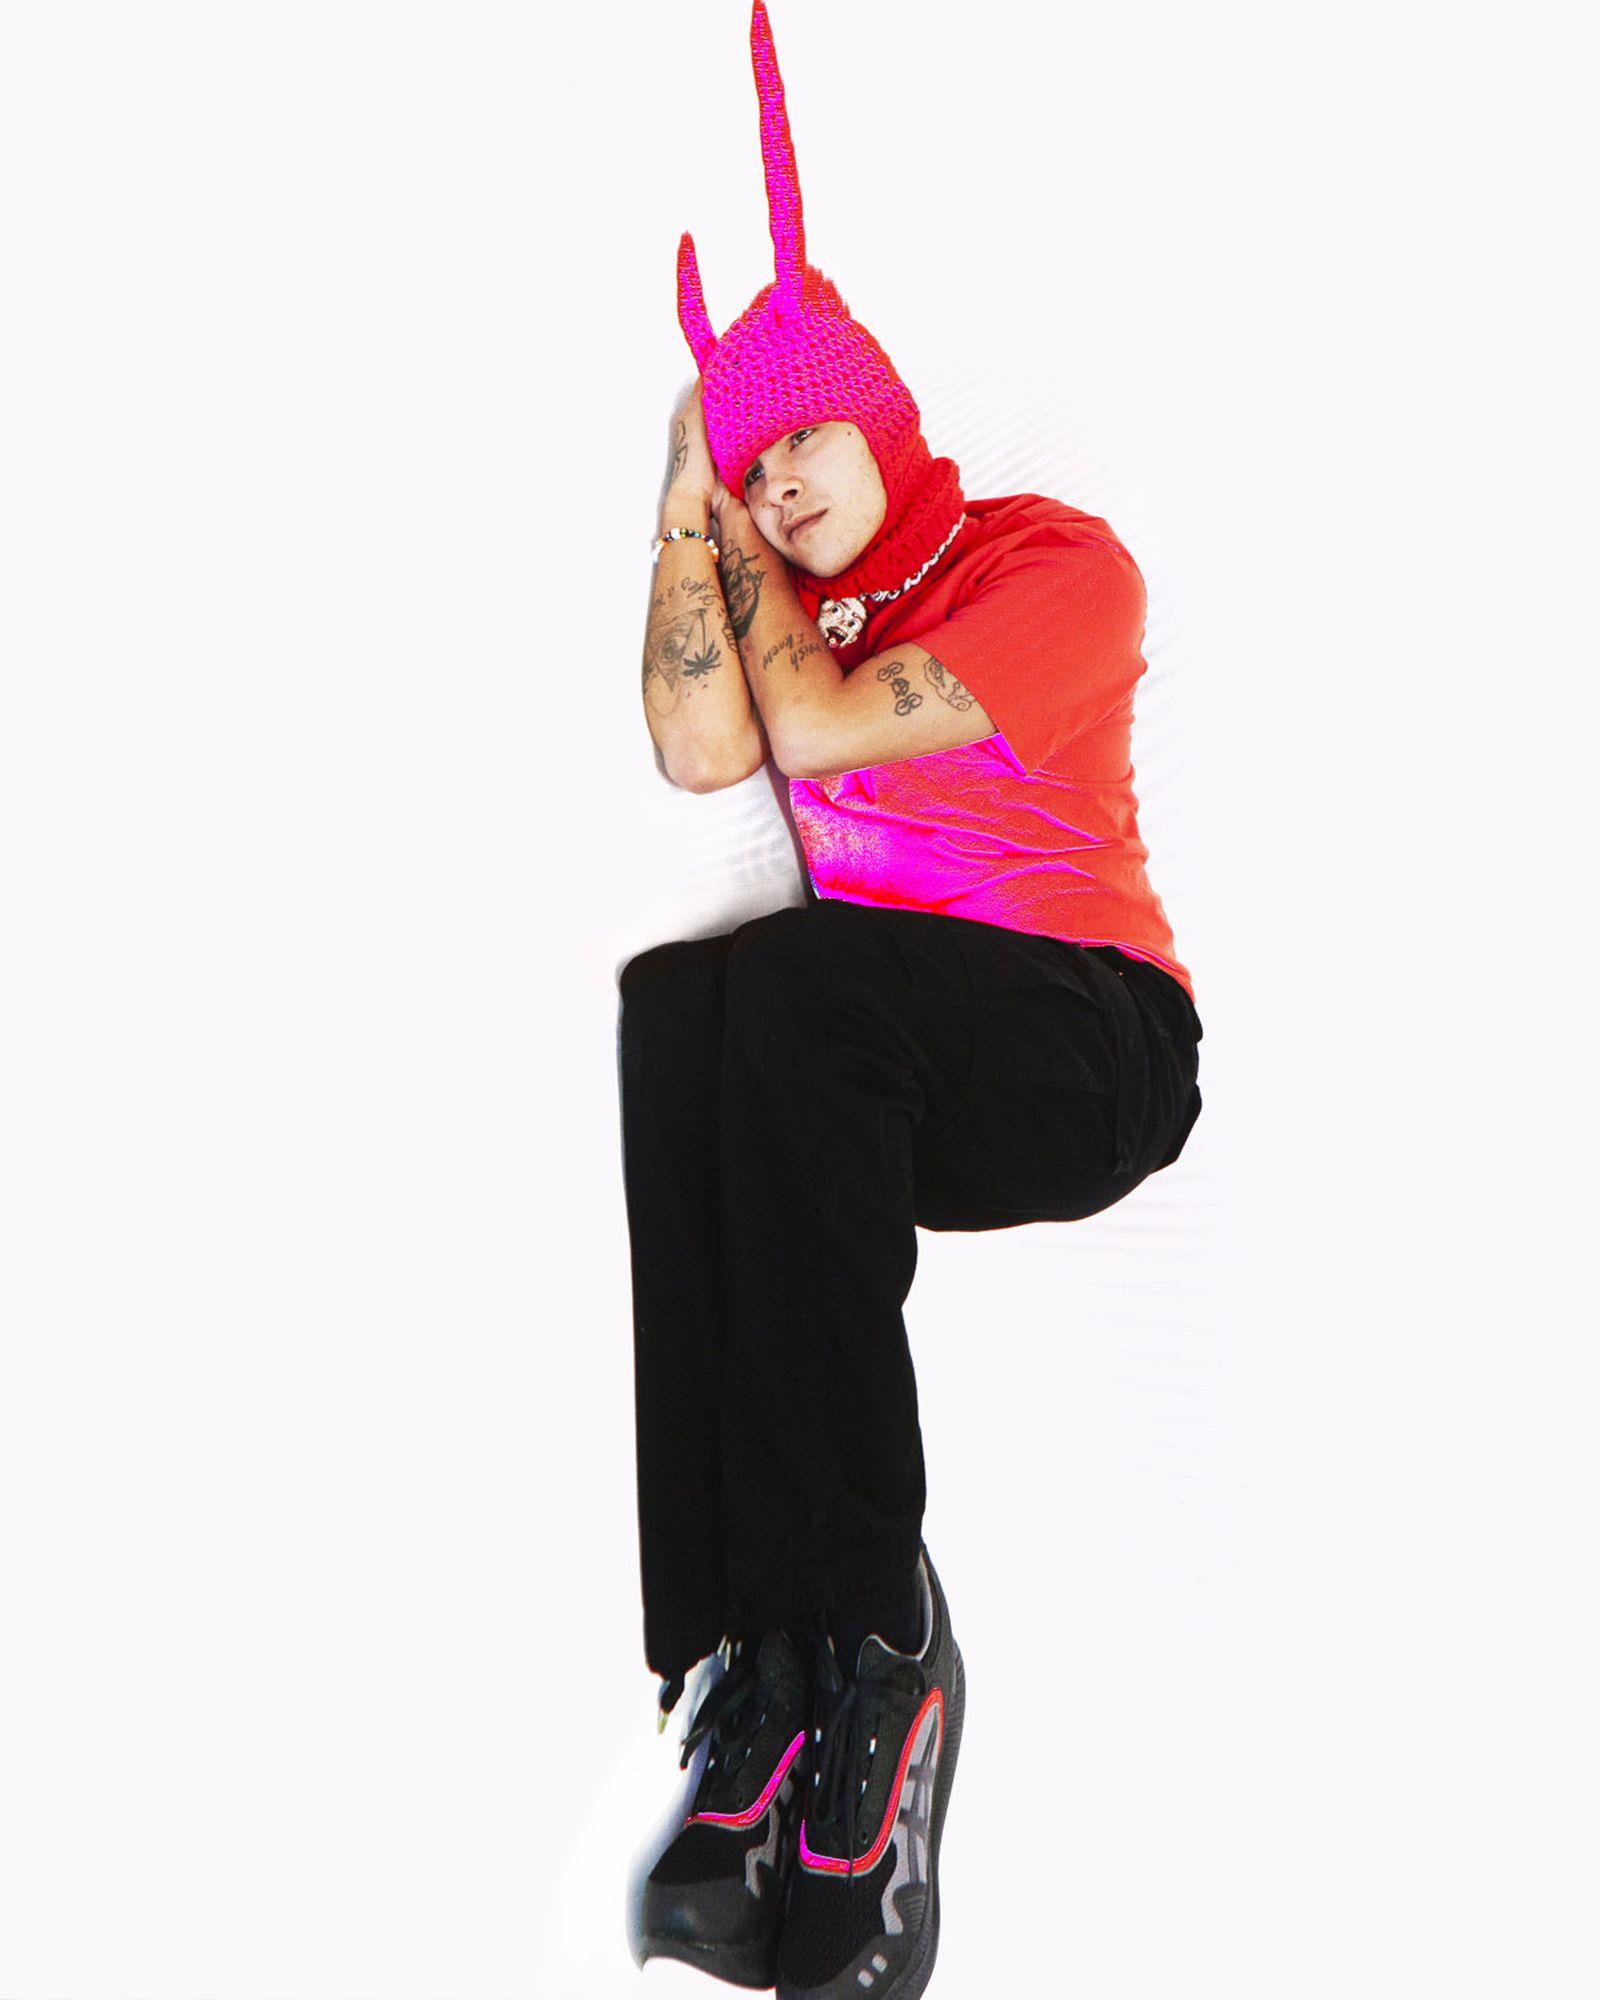 T-shirt 194 LOCAL Pants JUNYA WATANABE Hat MEG WELLS Sneakers KIKO KOSTADINOV X ASICS